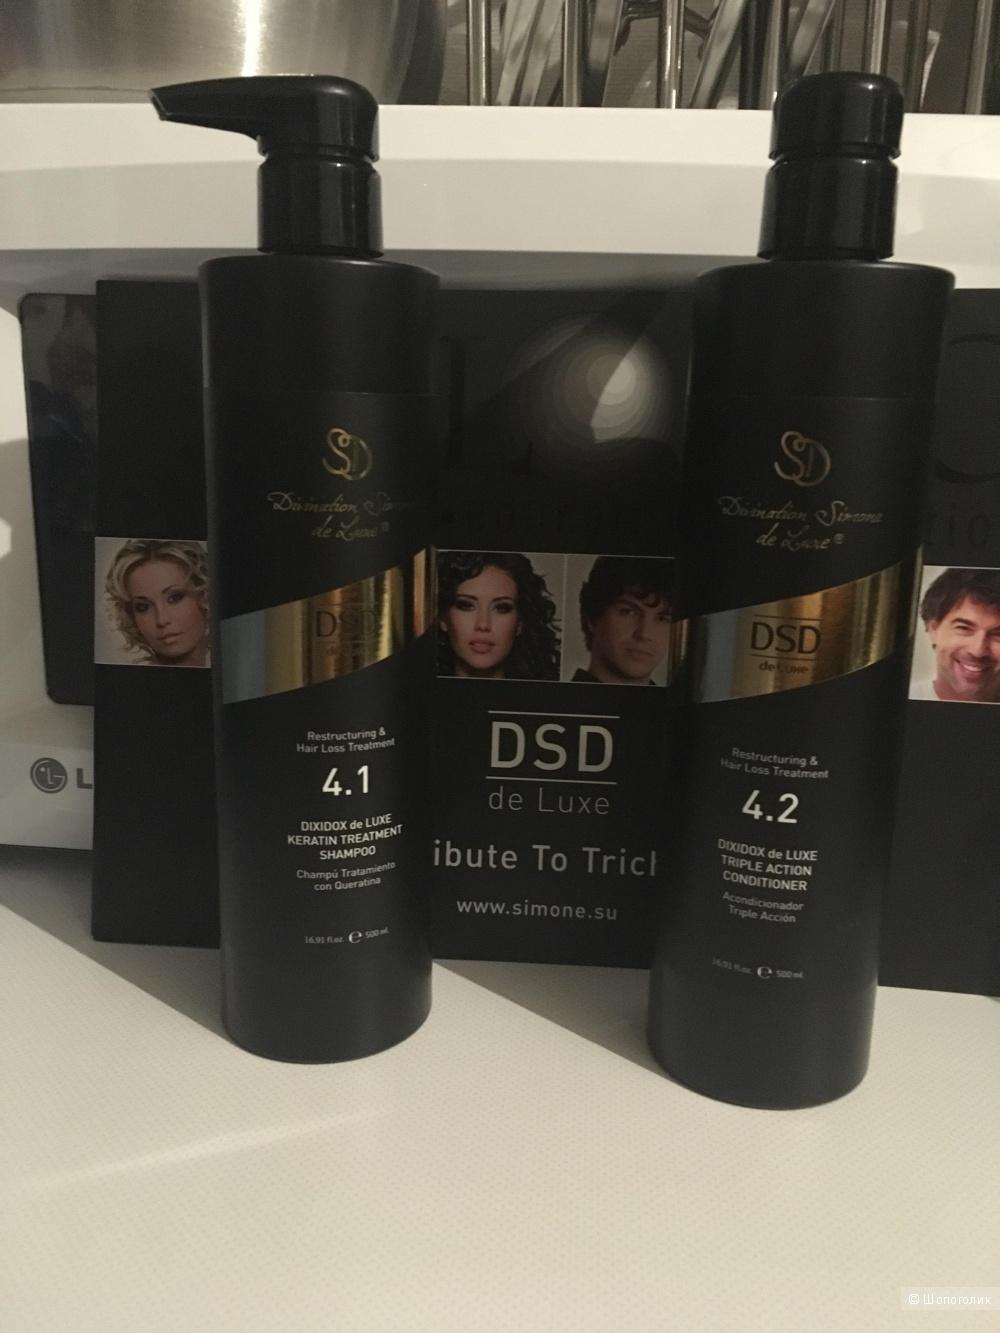 Сет: шампунь 4.1 и кондиционер 4.2 DSD Deluxe